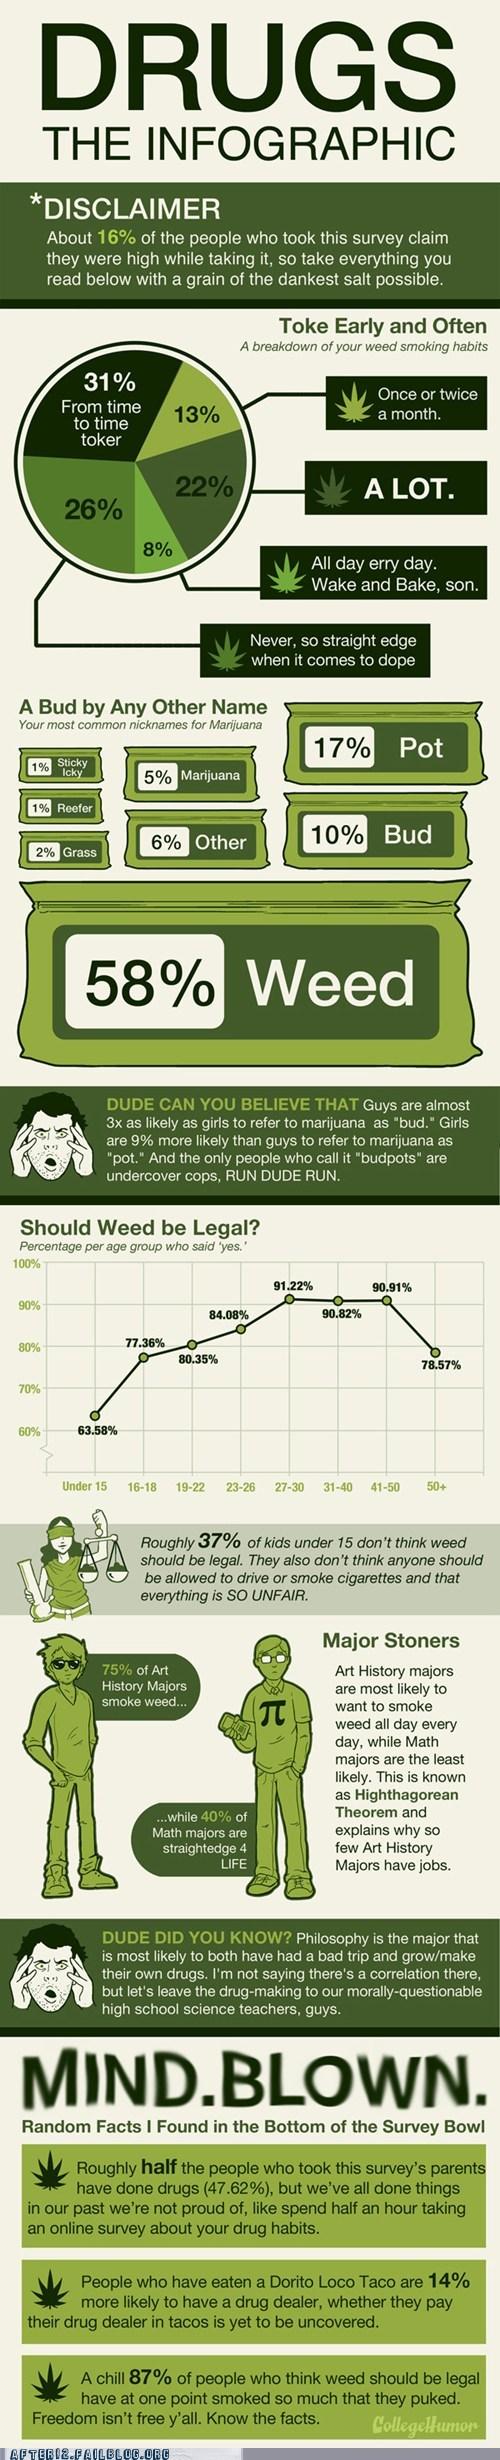 bud college humor dank drugs ganja grass green hash herb infographic Legalize It marijuana pot toke weed - 6280613888